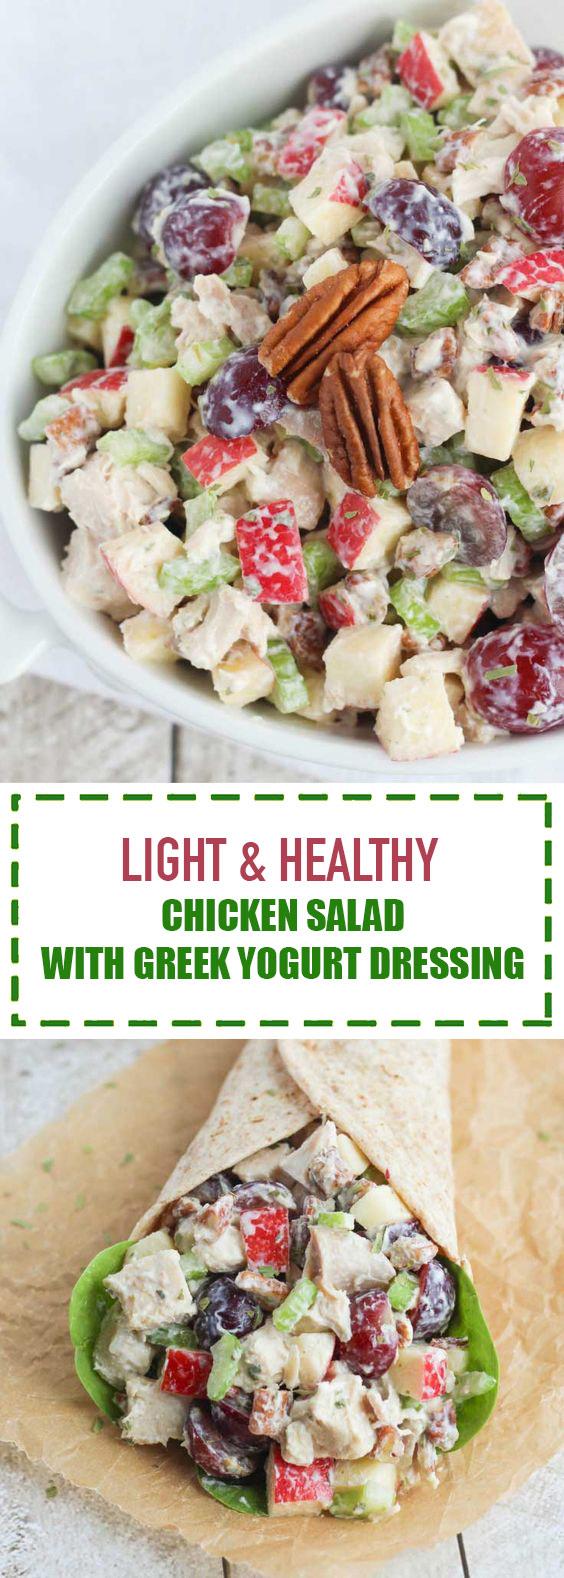 Light & Healthy Chicken Salad with Greek Yogurt Dressing